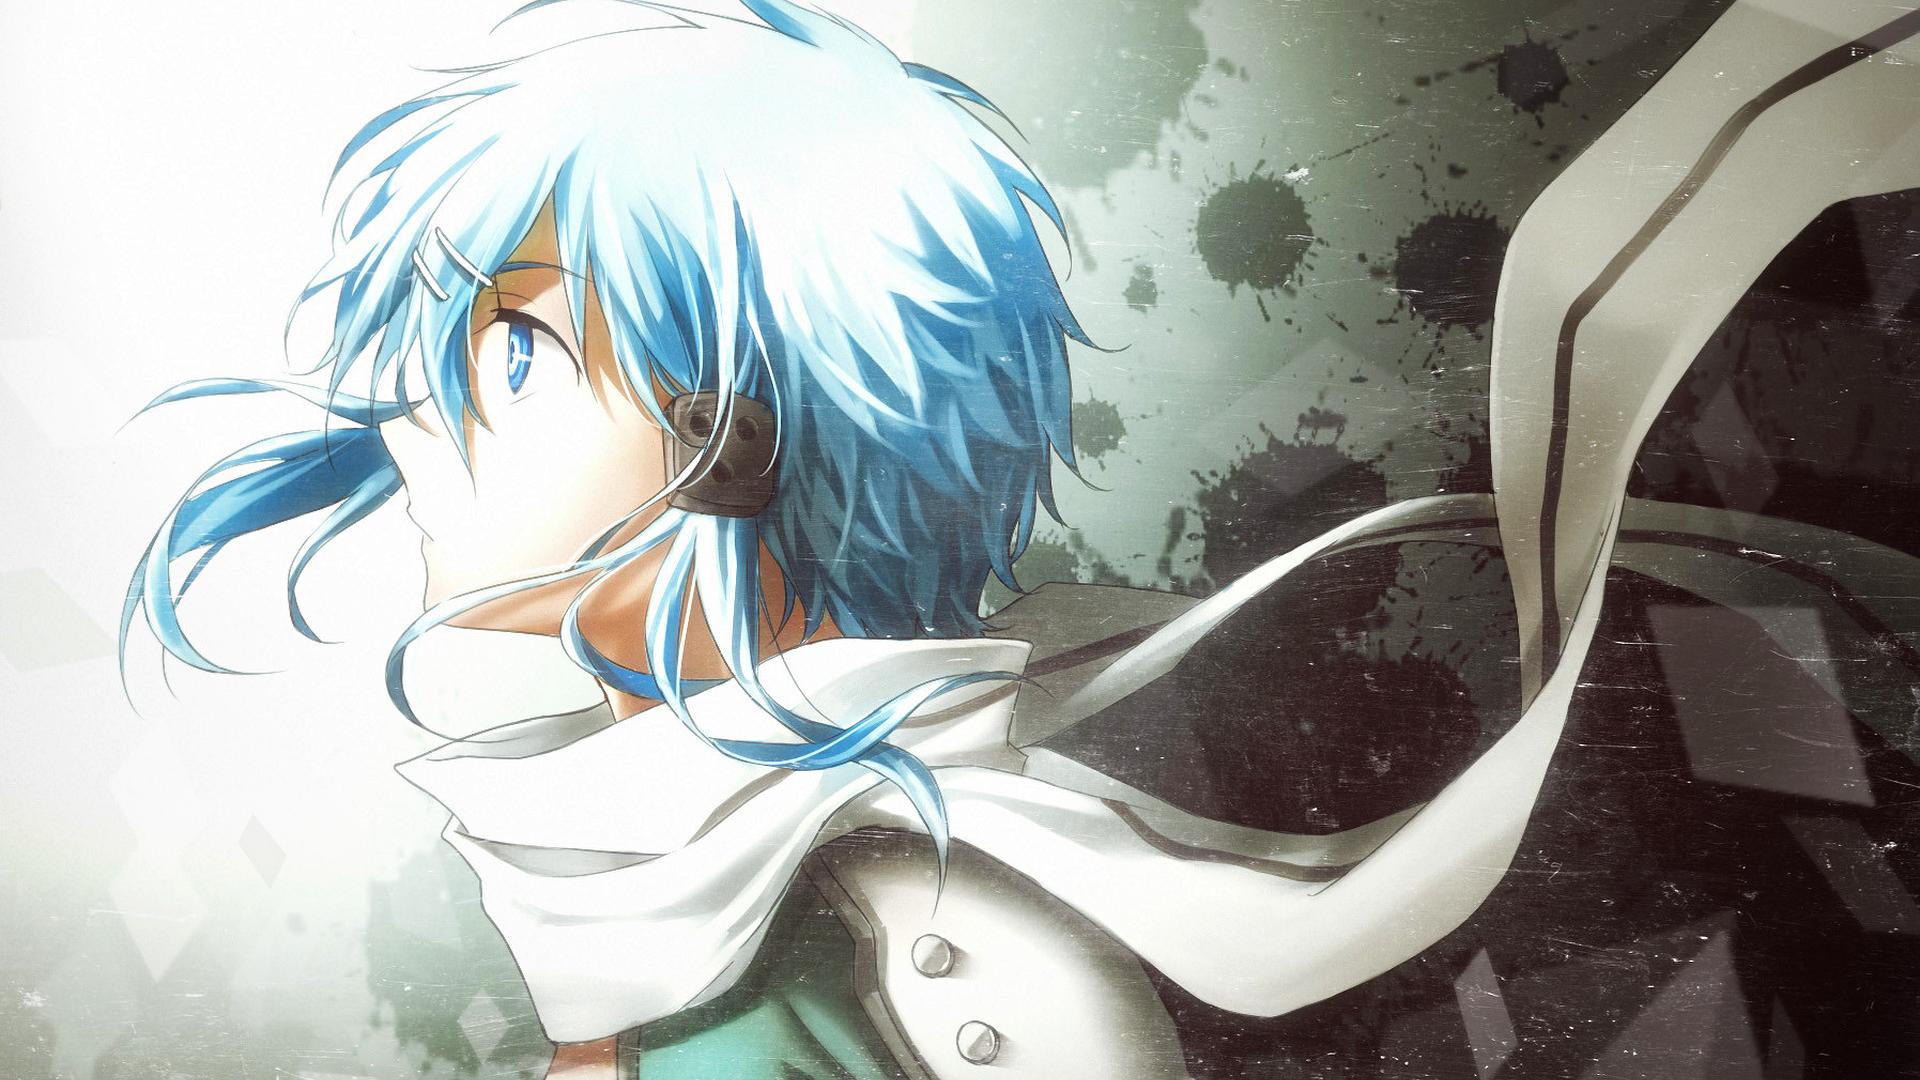 Wallpaper : manga, Sword Art Online, Asada Shino 1920x1080 ...